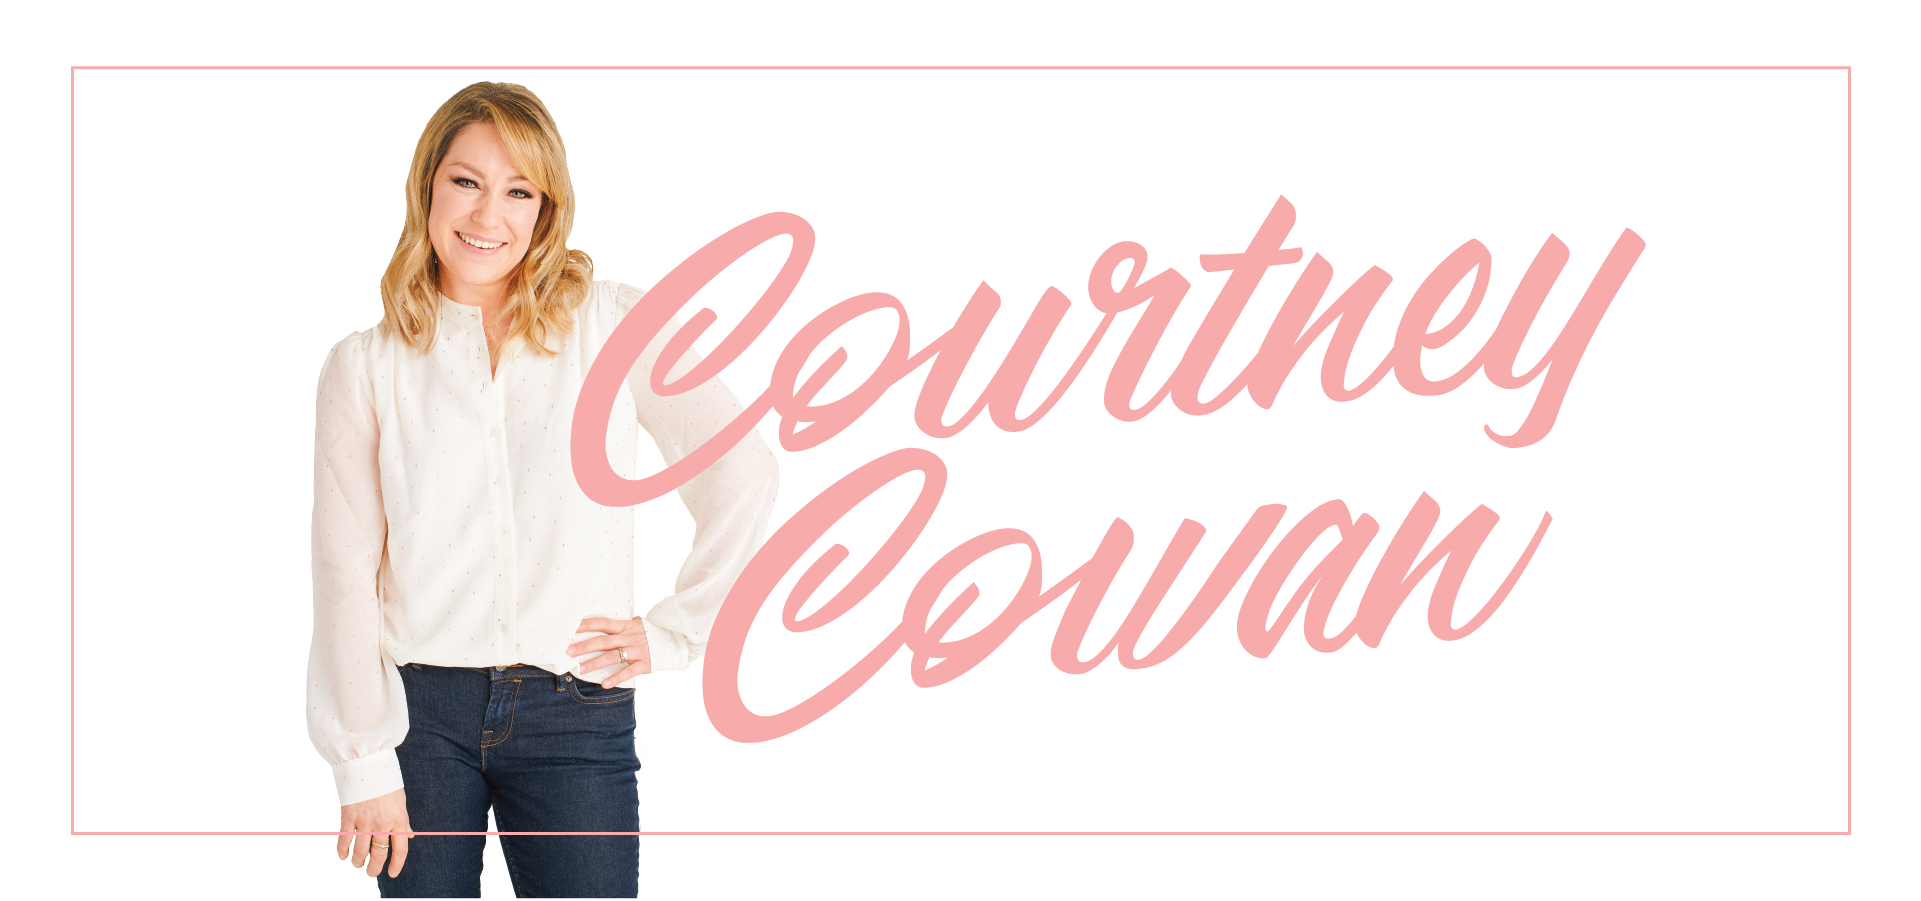 Courtney_header.png